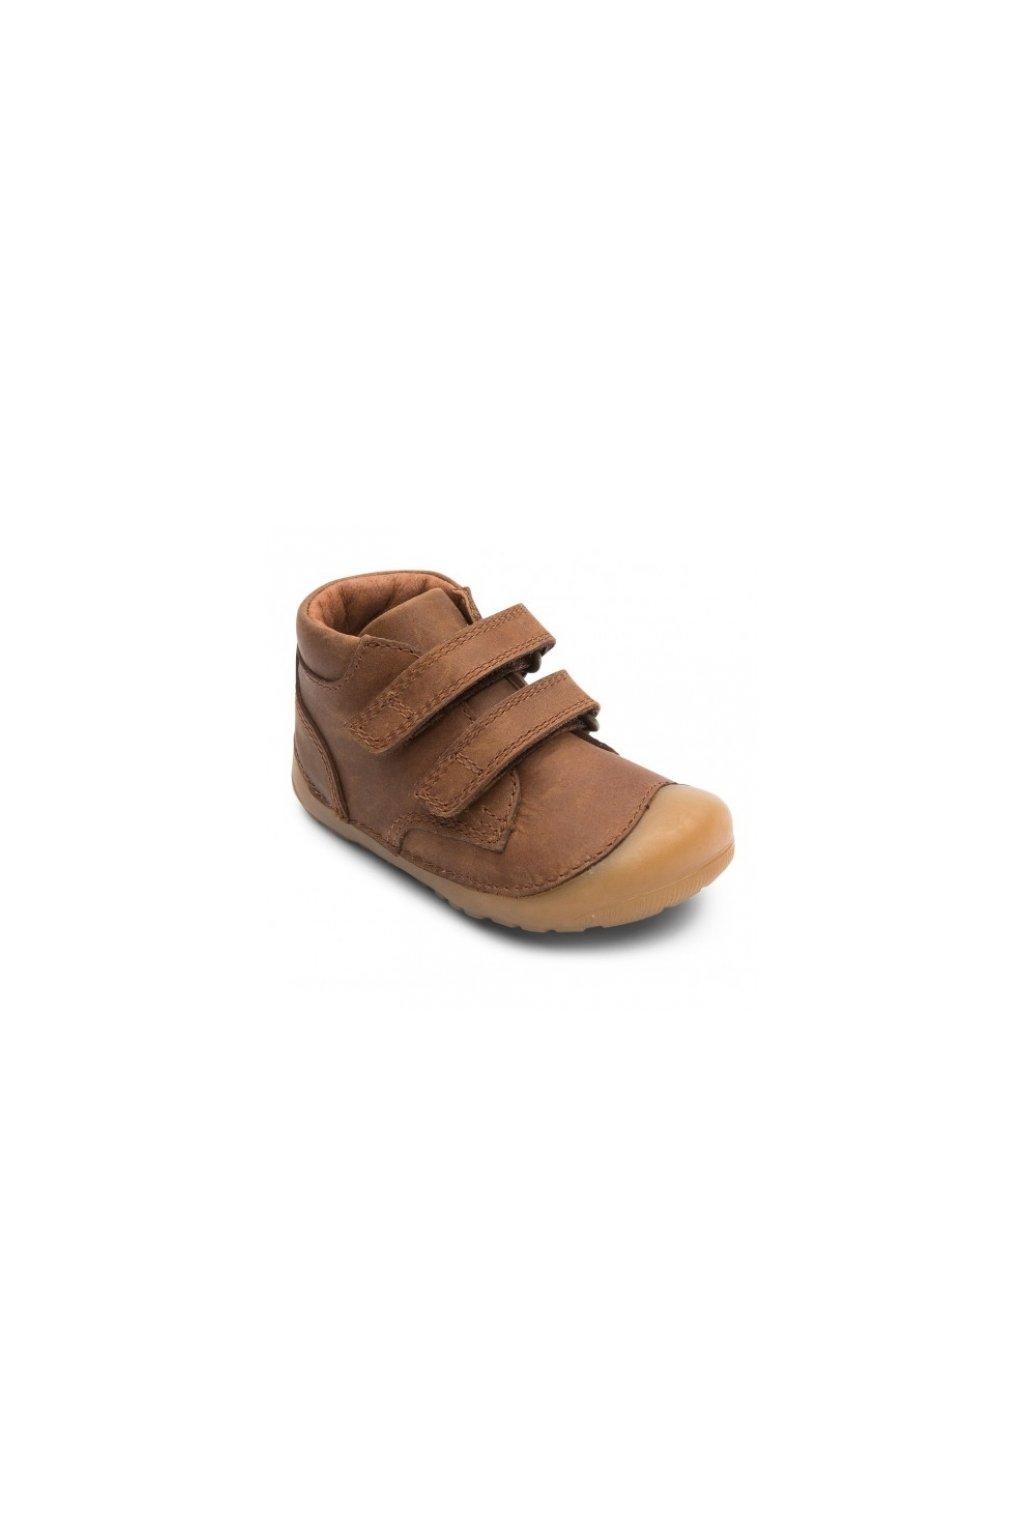 Bundgaard Petit Velcro - Brown